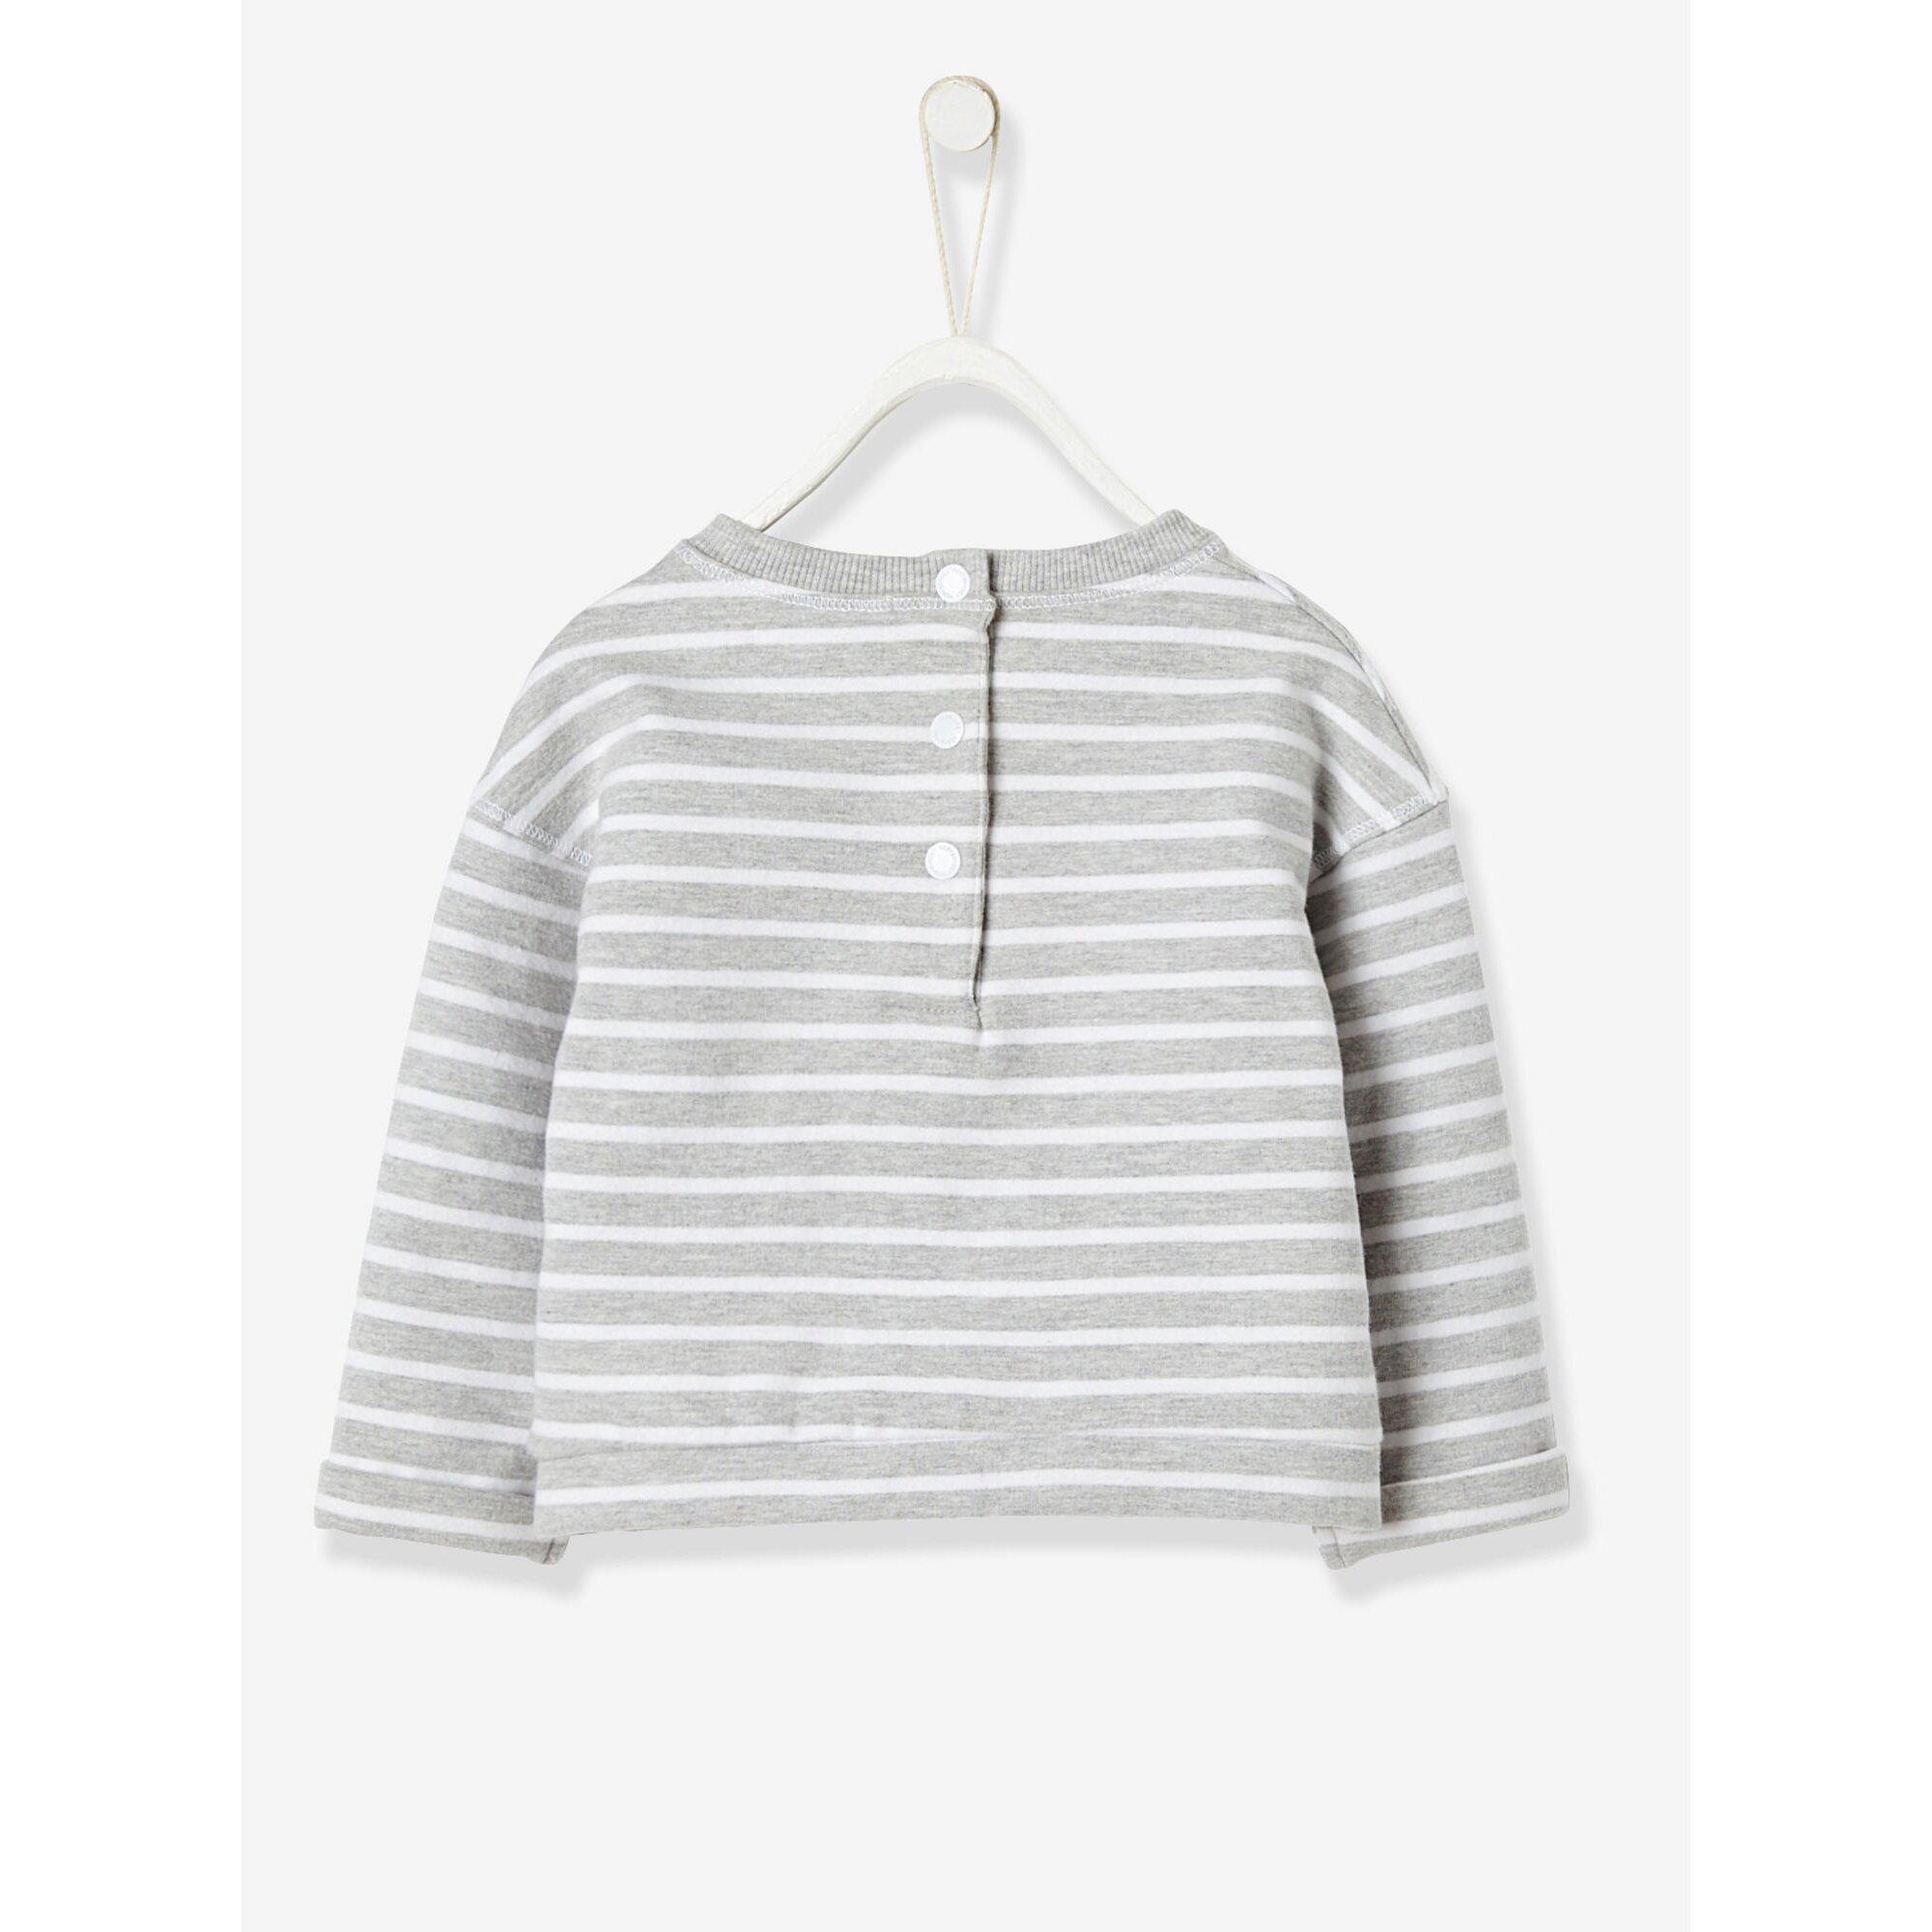 vertbaudet-sweatshirt-fur-baby-madchen, 15.99 EUR @ babywalz-de